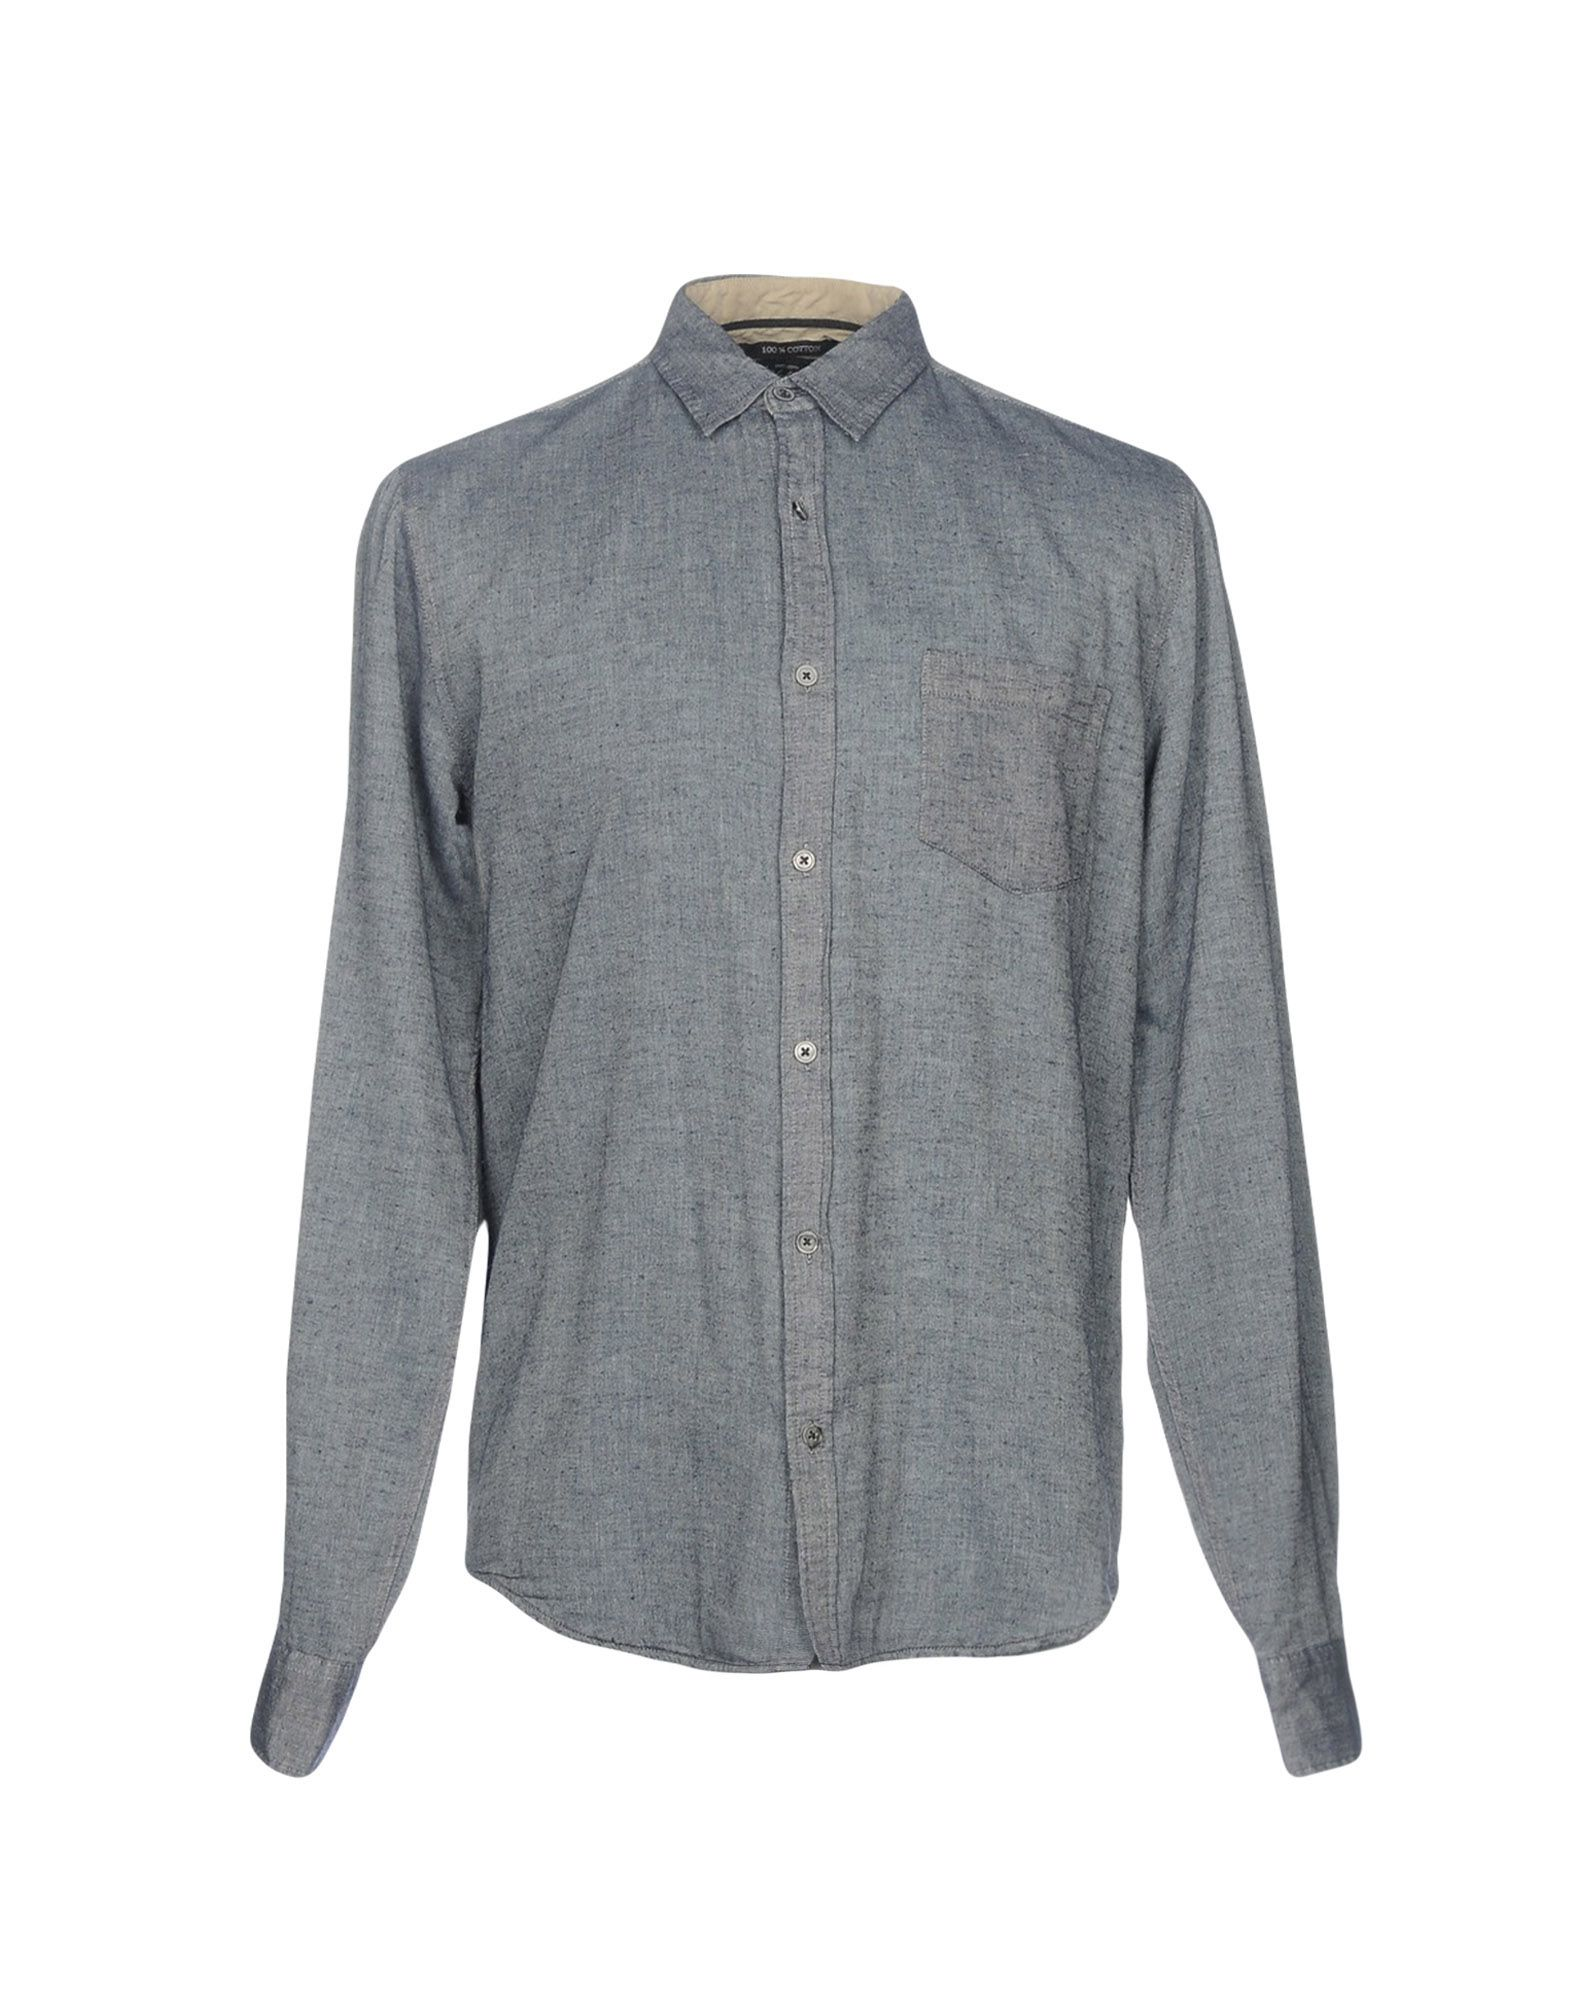 GILDED AGE Pубашка рубашка мужская greg цвет сиреневый 720 309 lv zv размер 38 44